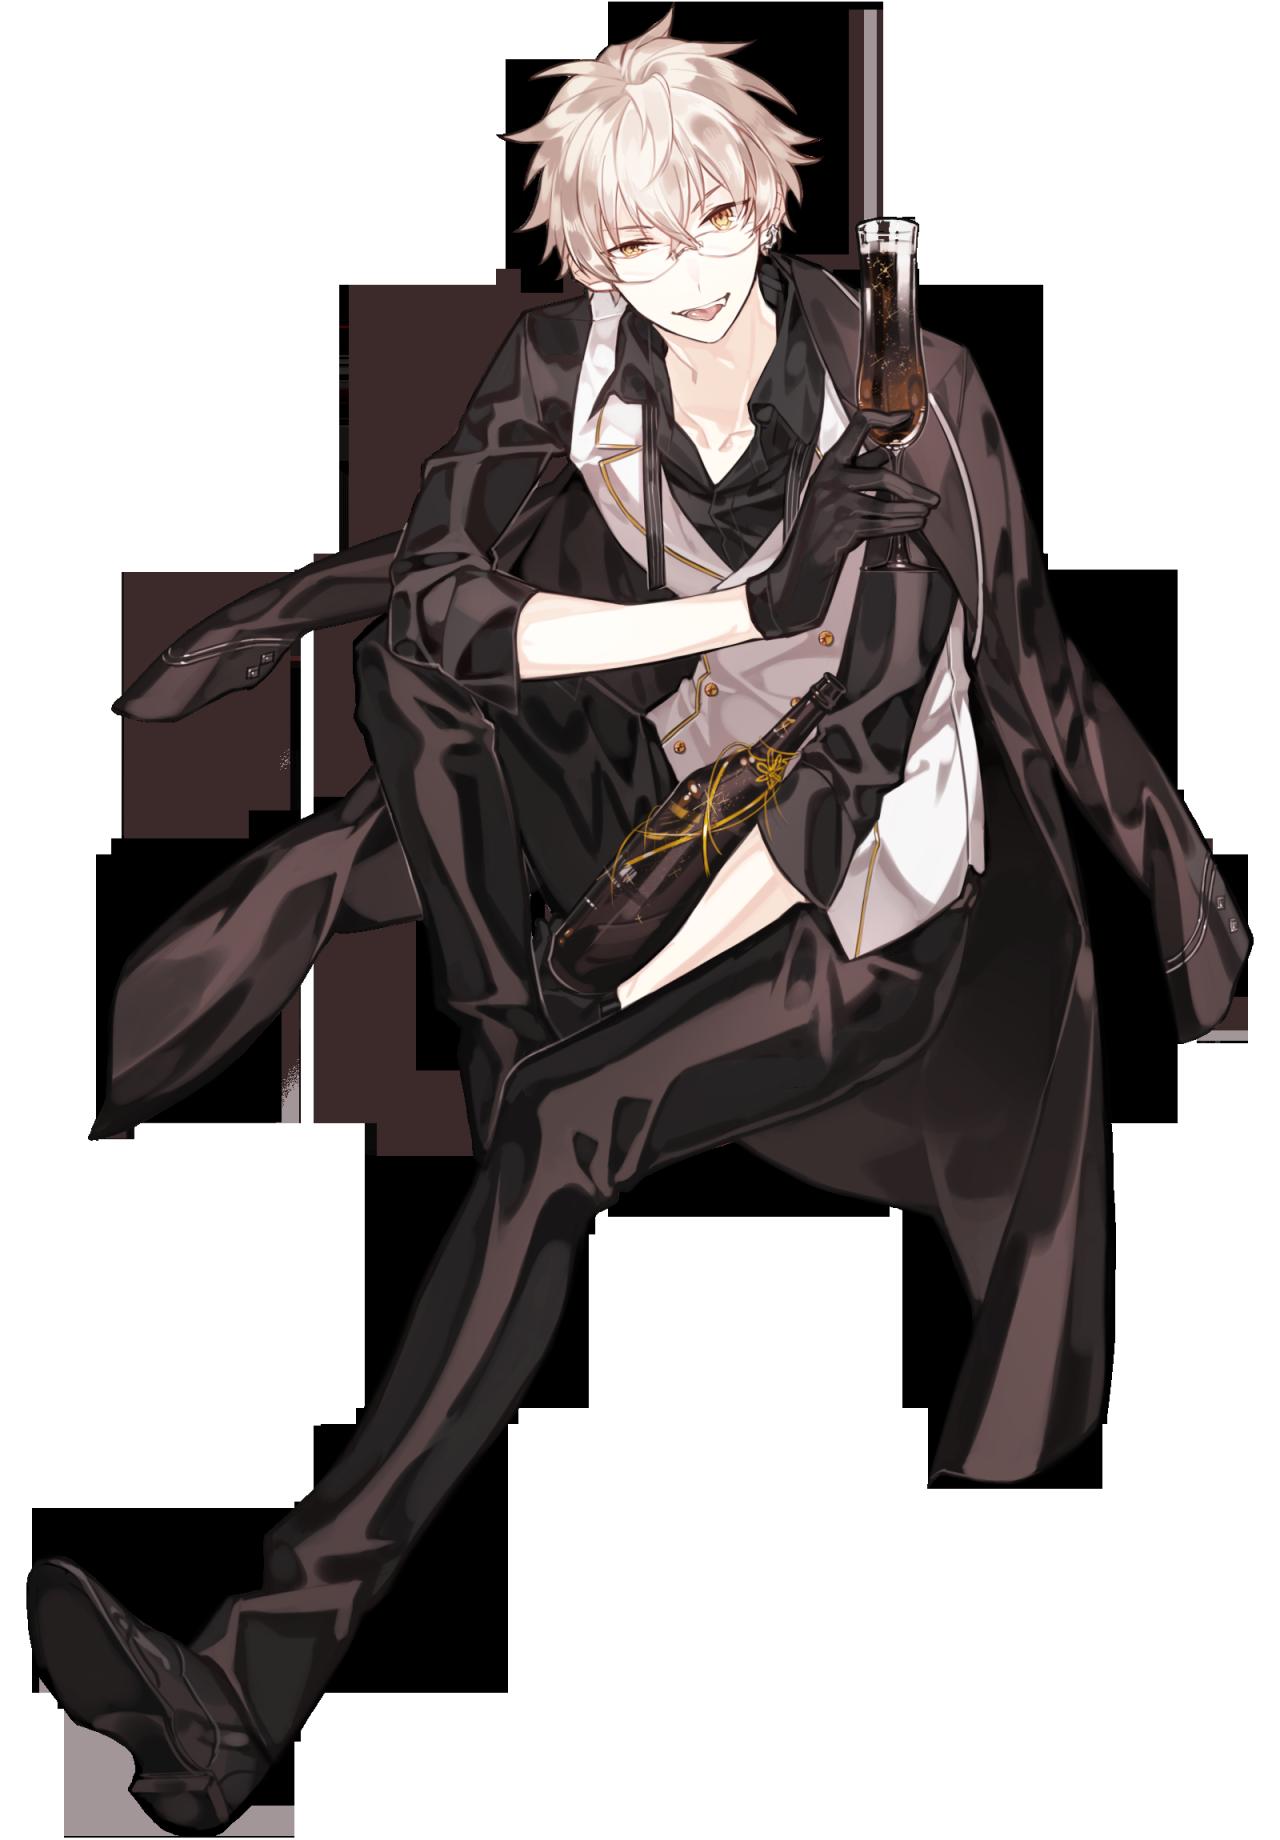 characterconcepts에 있는 Natsume rin 夏目 凜님의 핀 캐릭터 일러스트, 캐릭터